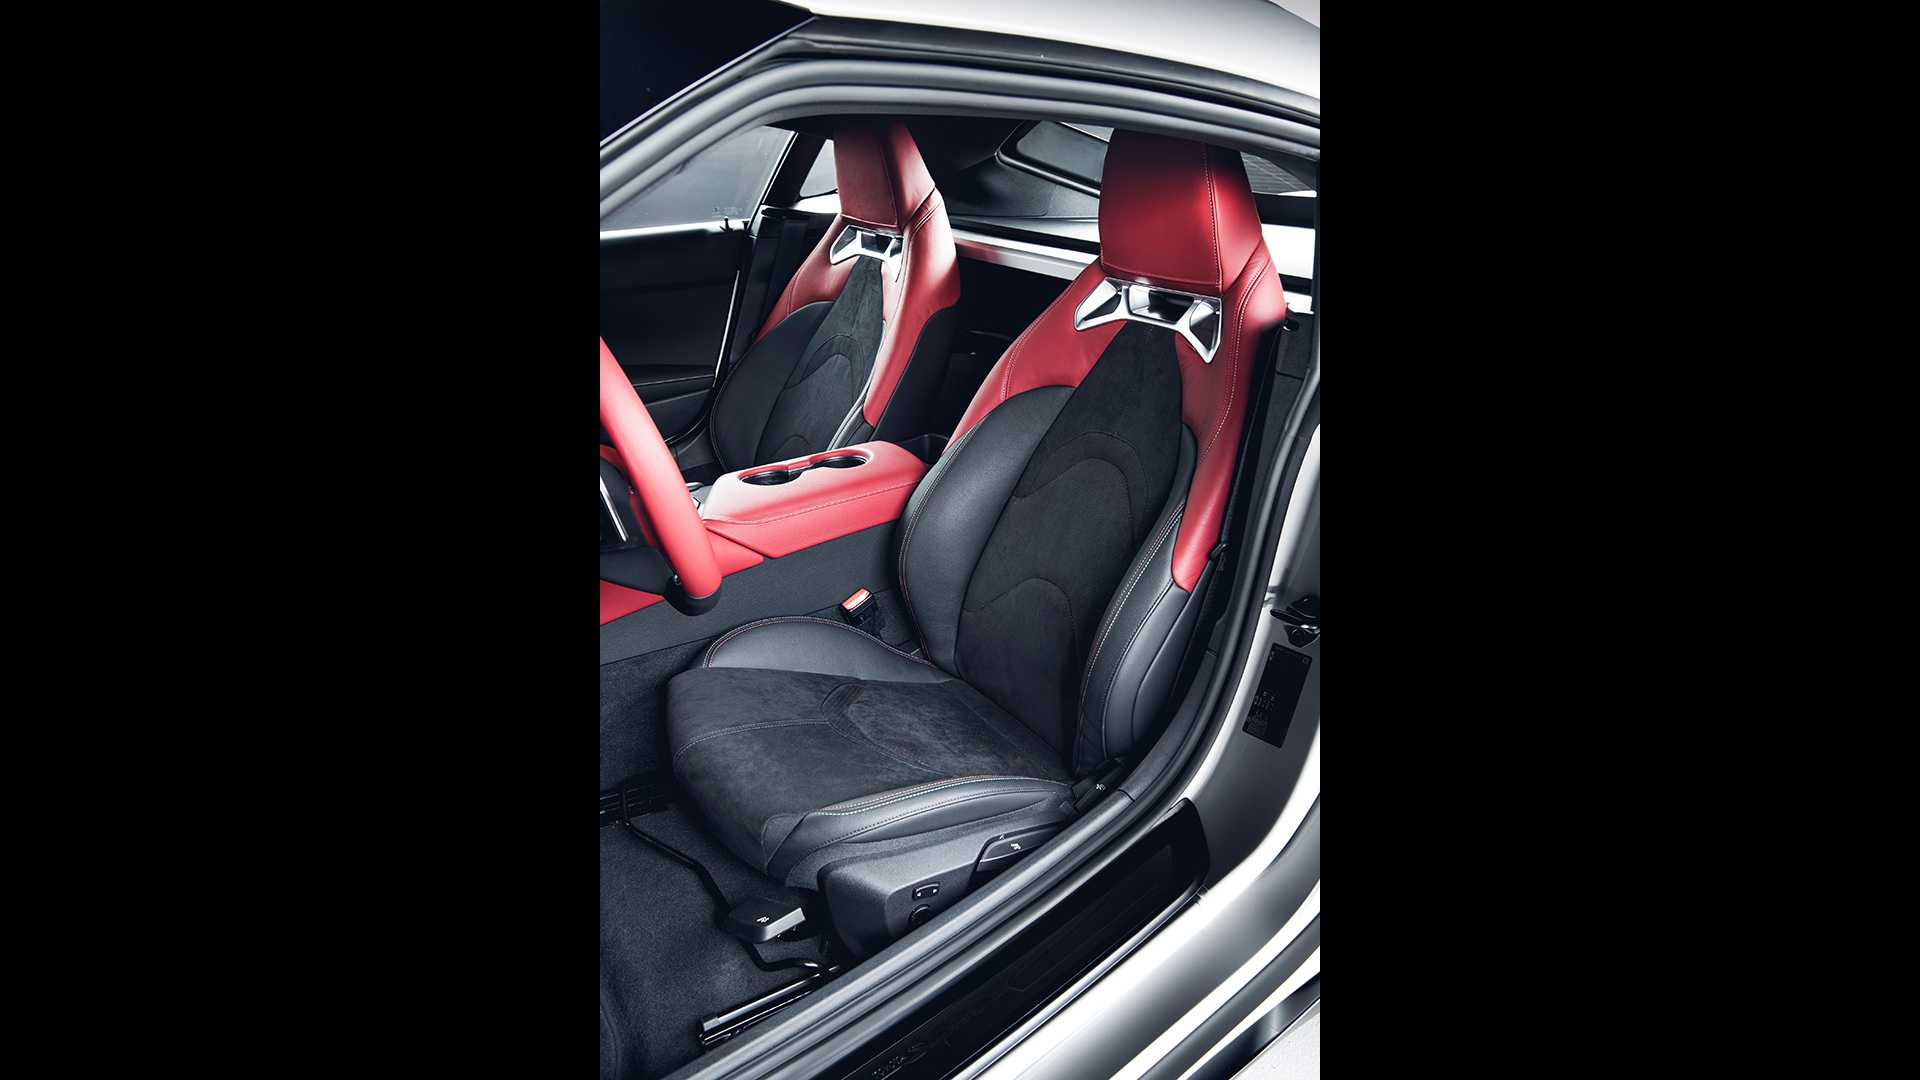 Toyota GR Supra 2.0 Turbo